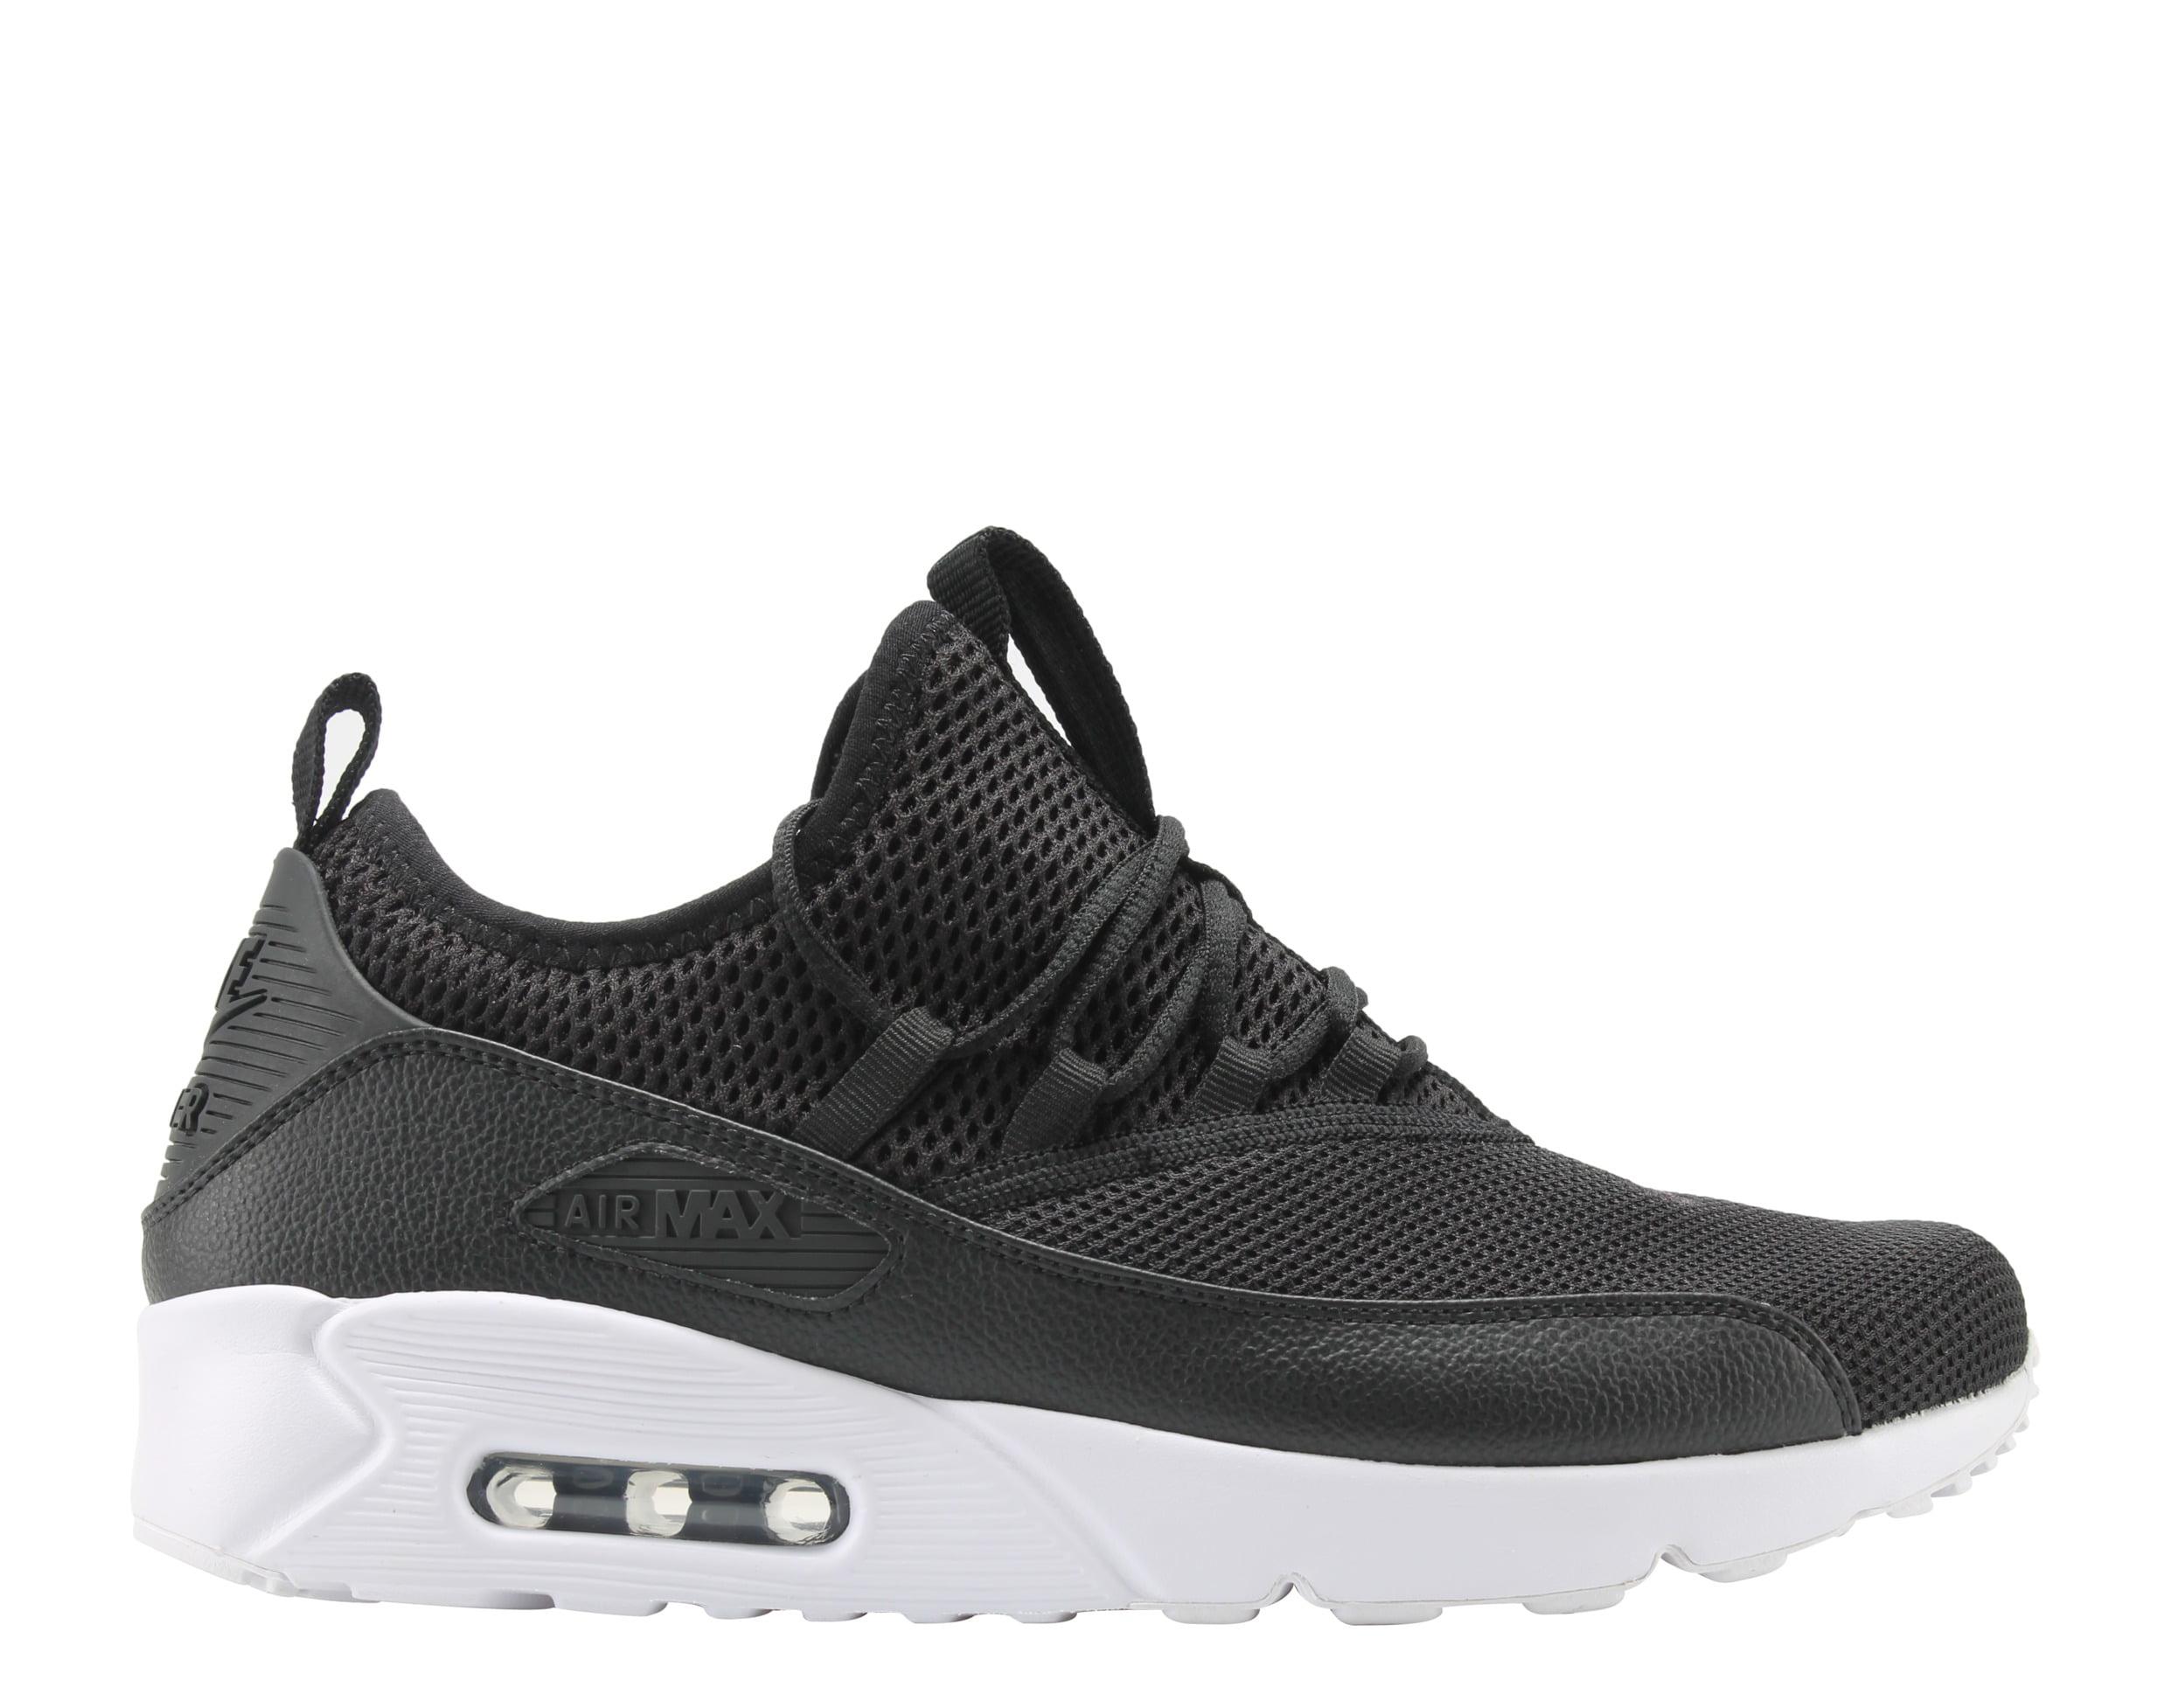 Nike Air Max 90 EZ Black/Black-White Men's Running Shoes AO1745-001